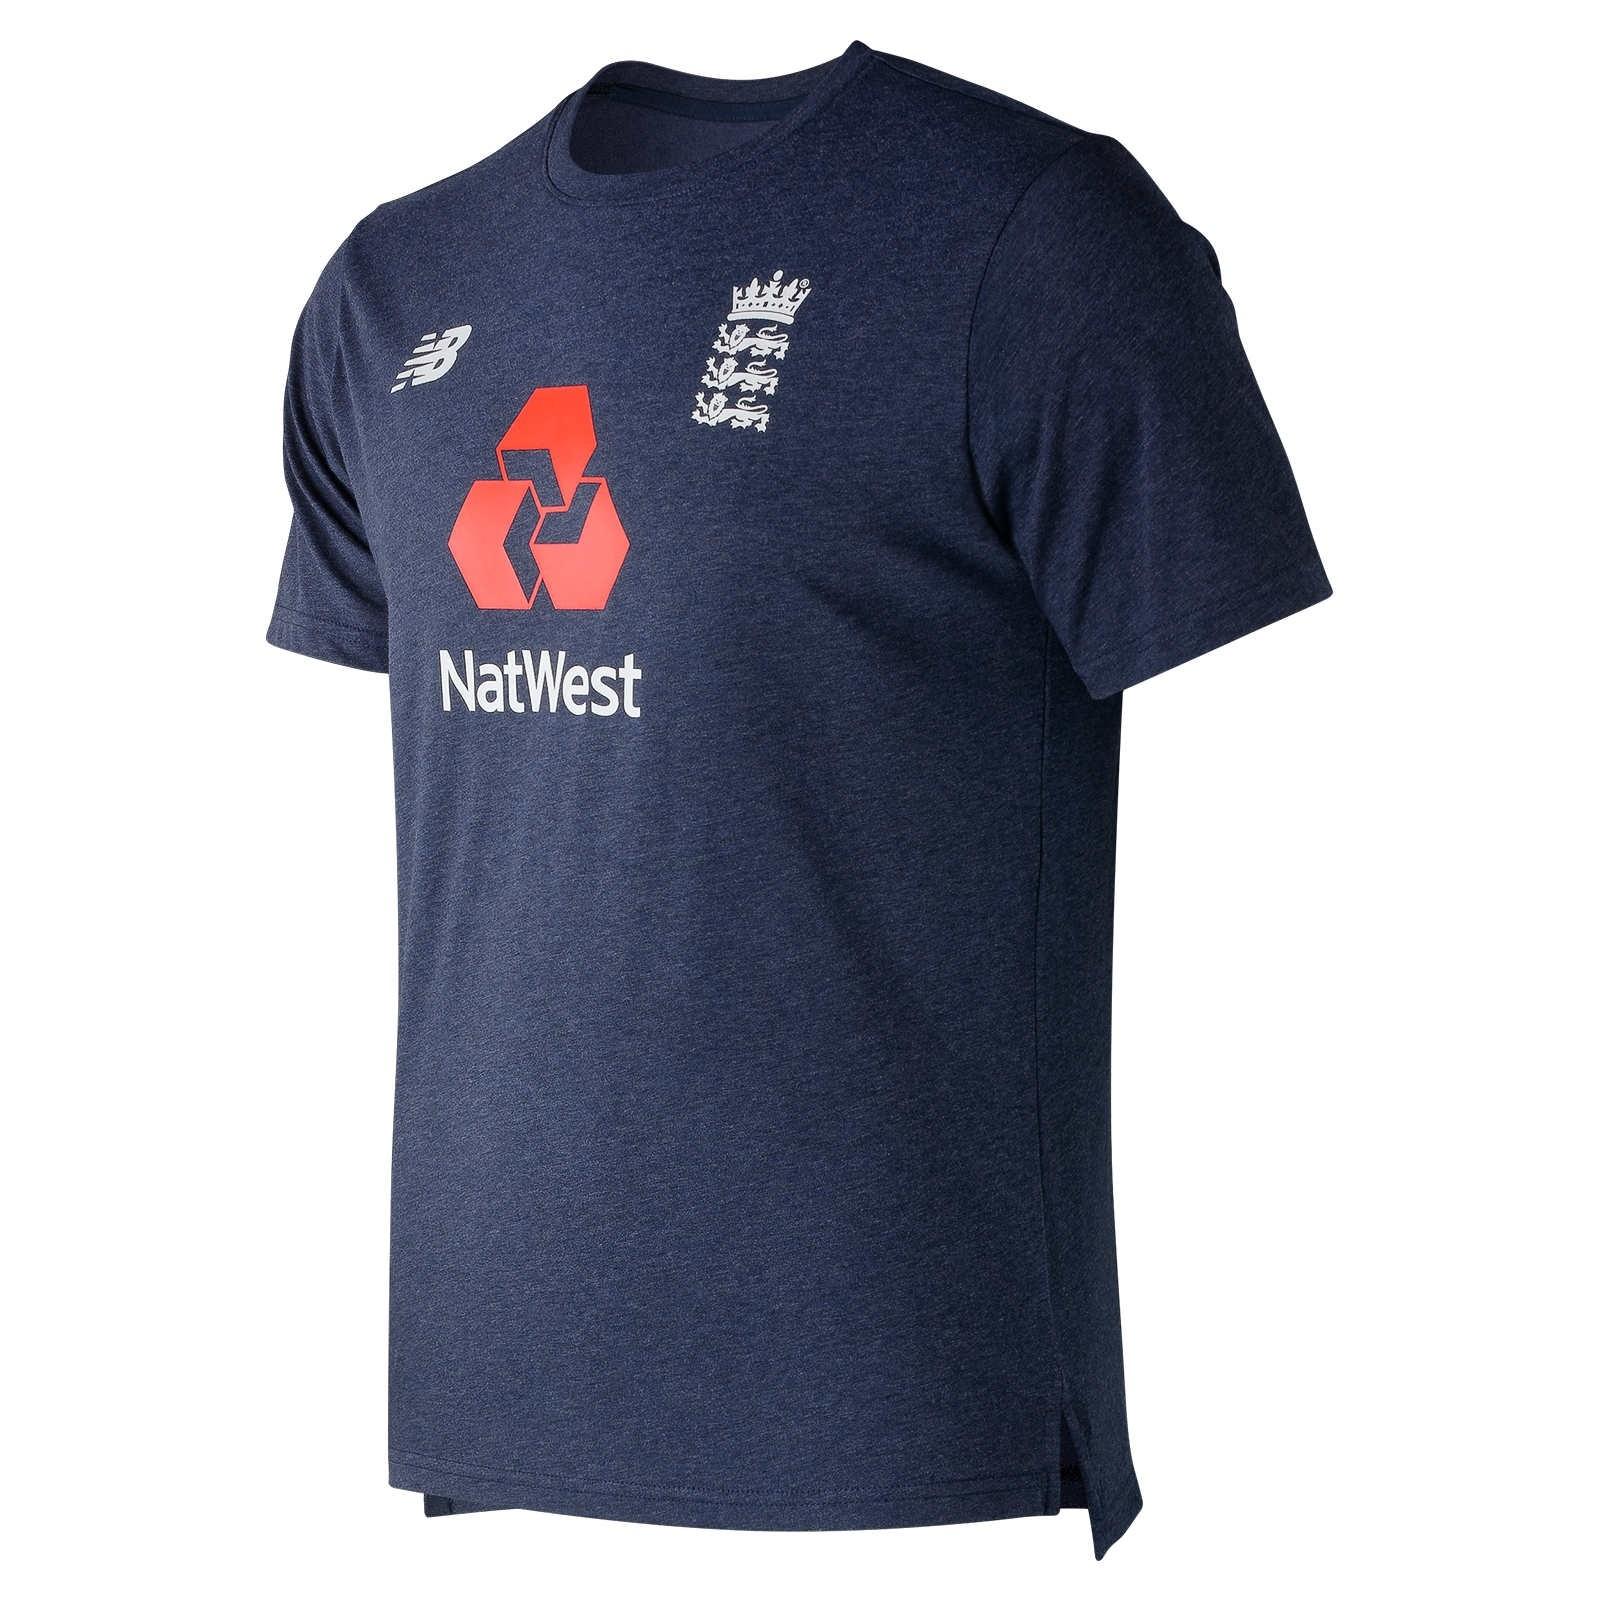 2019 New Balance England Heather T-Shirt - Galaxy